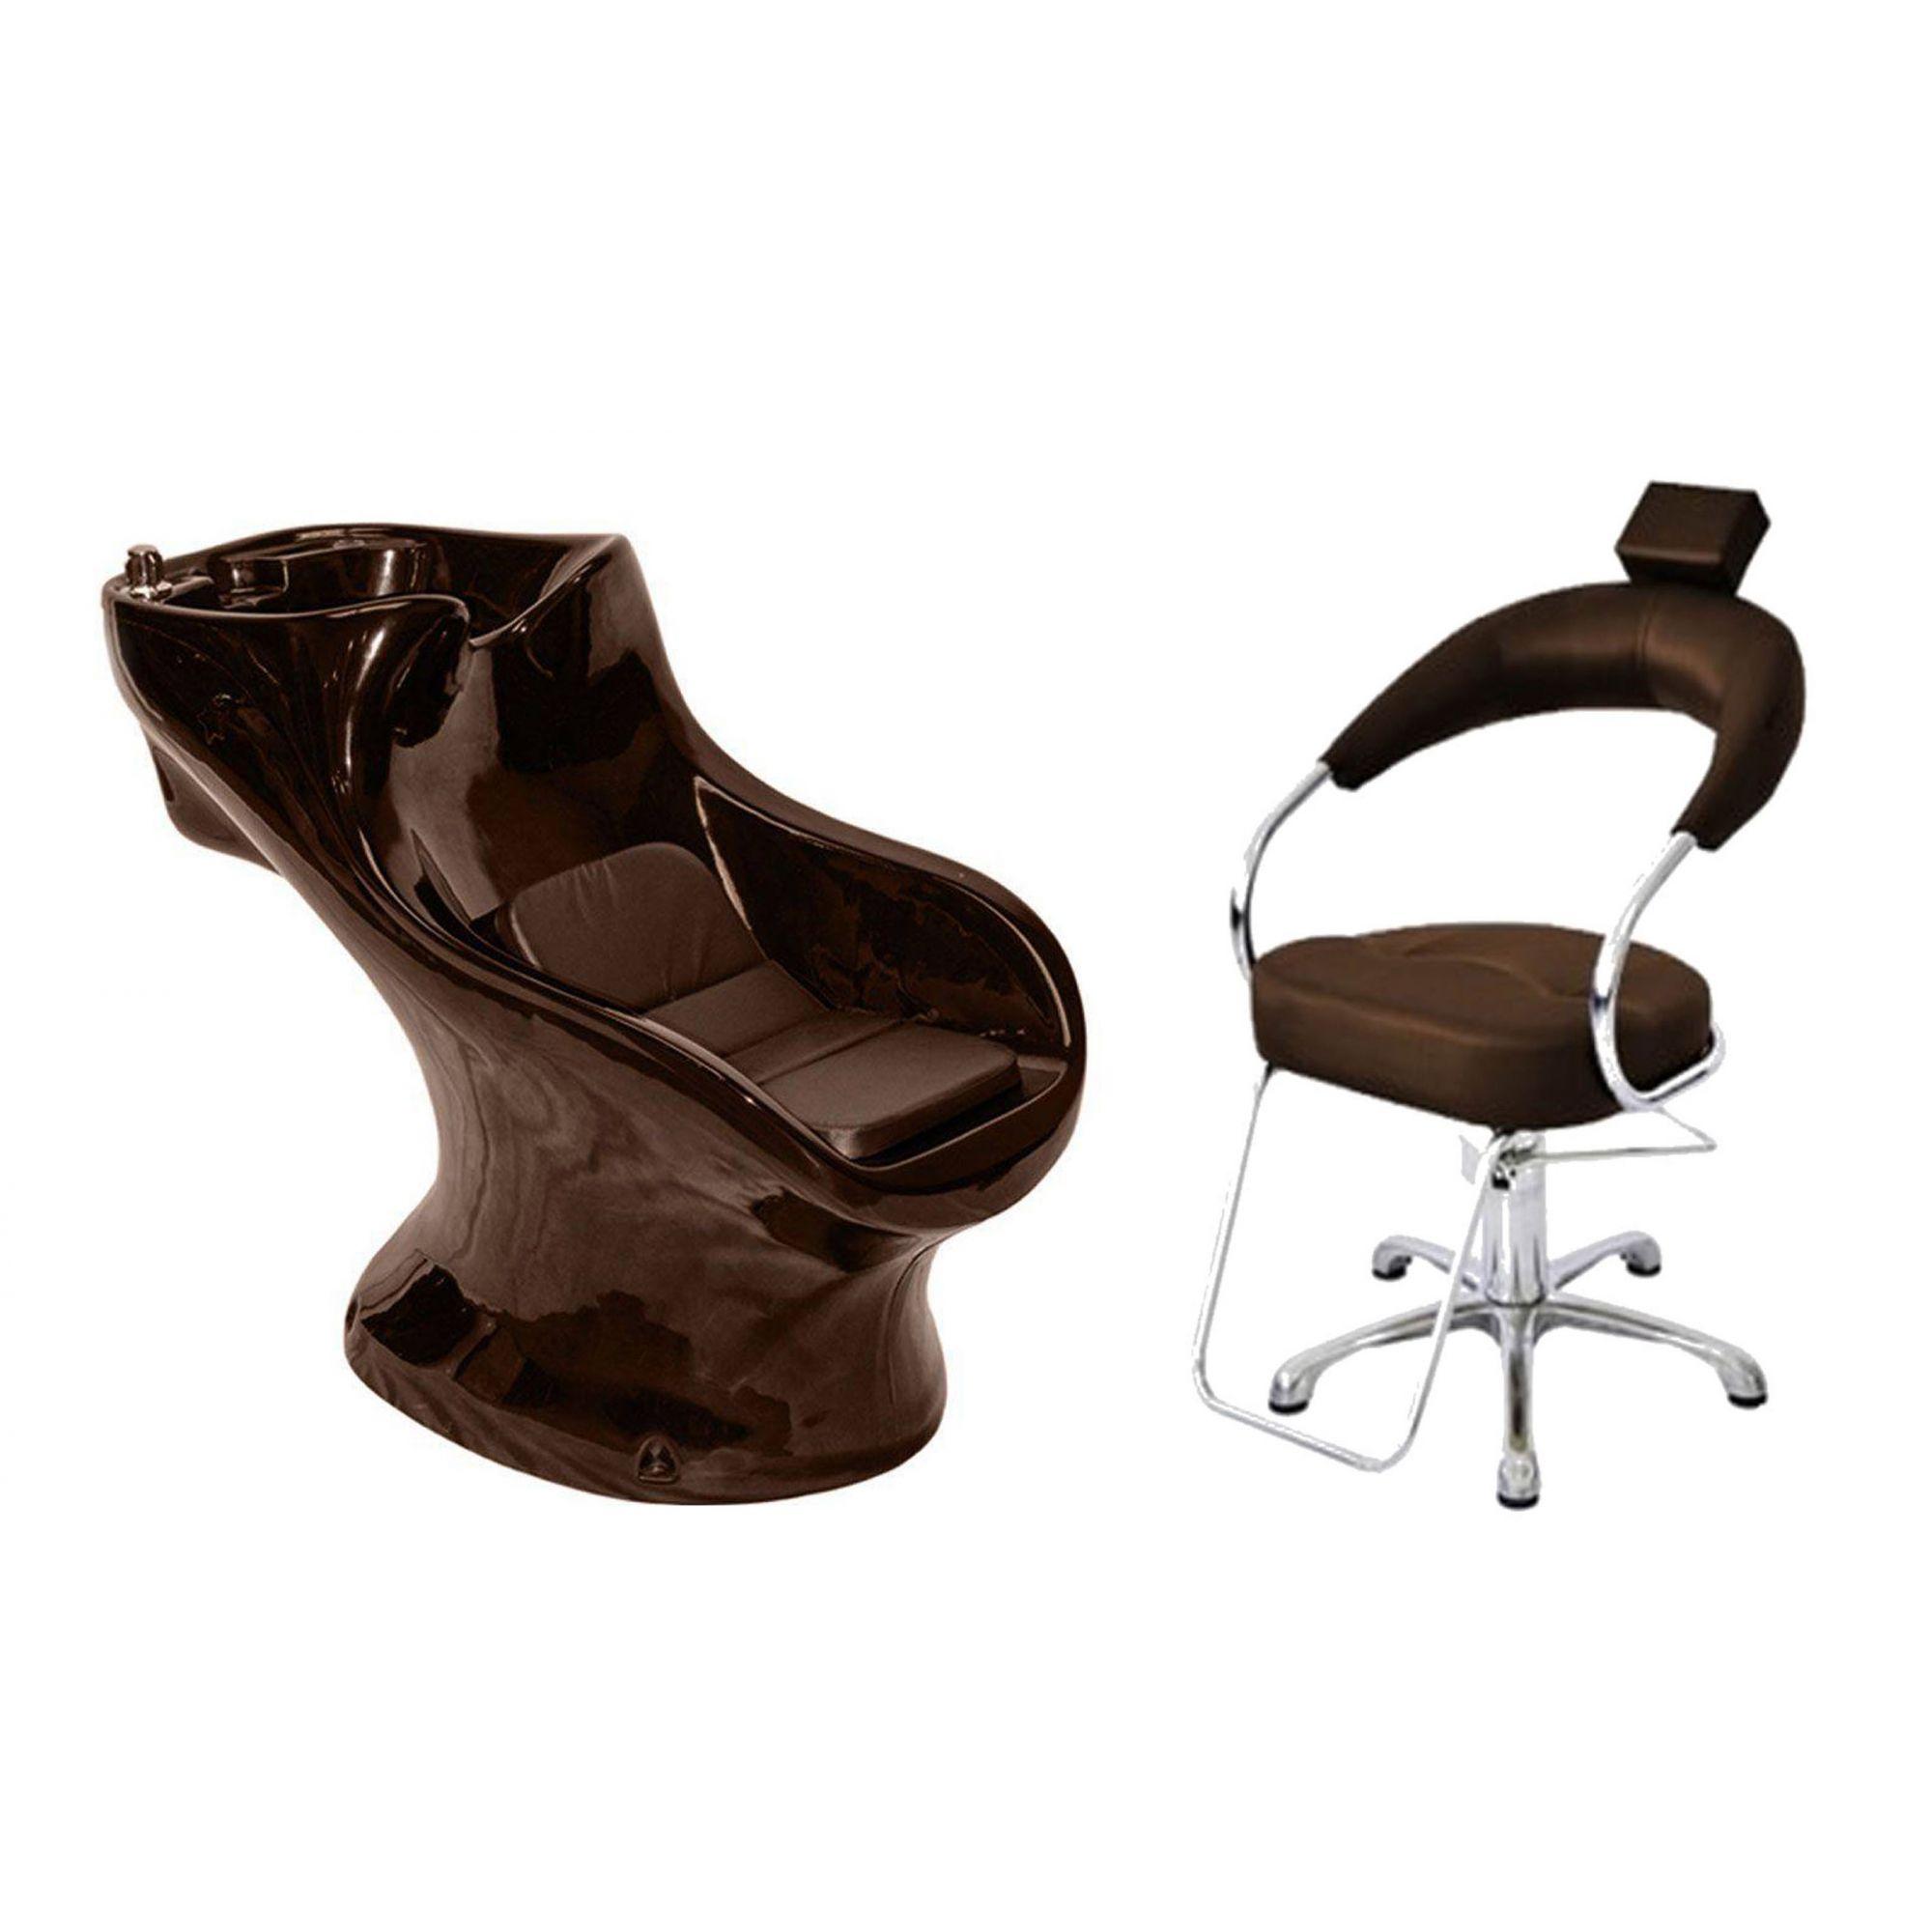 Lavatório Star Italiano + Cadeira Hidráulica Futurama